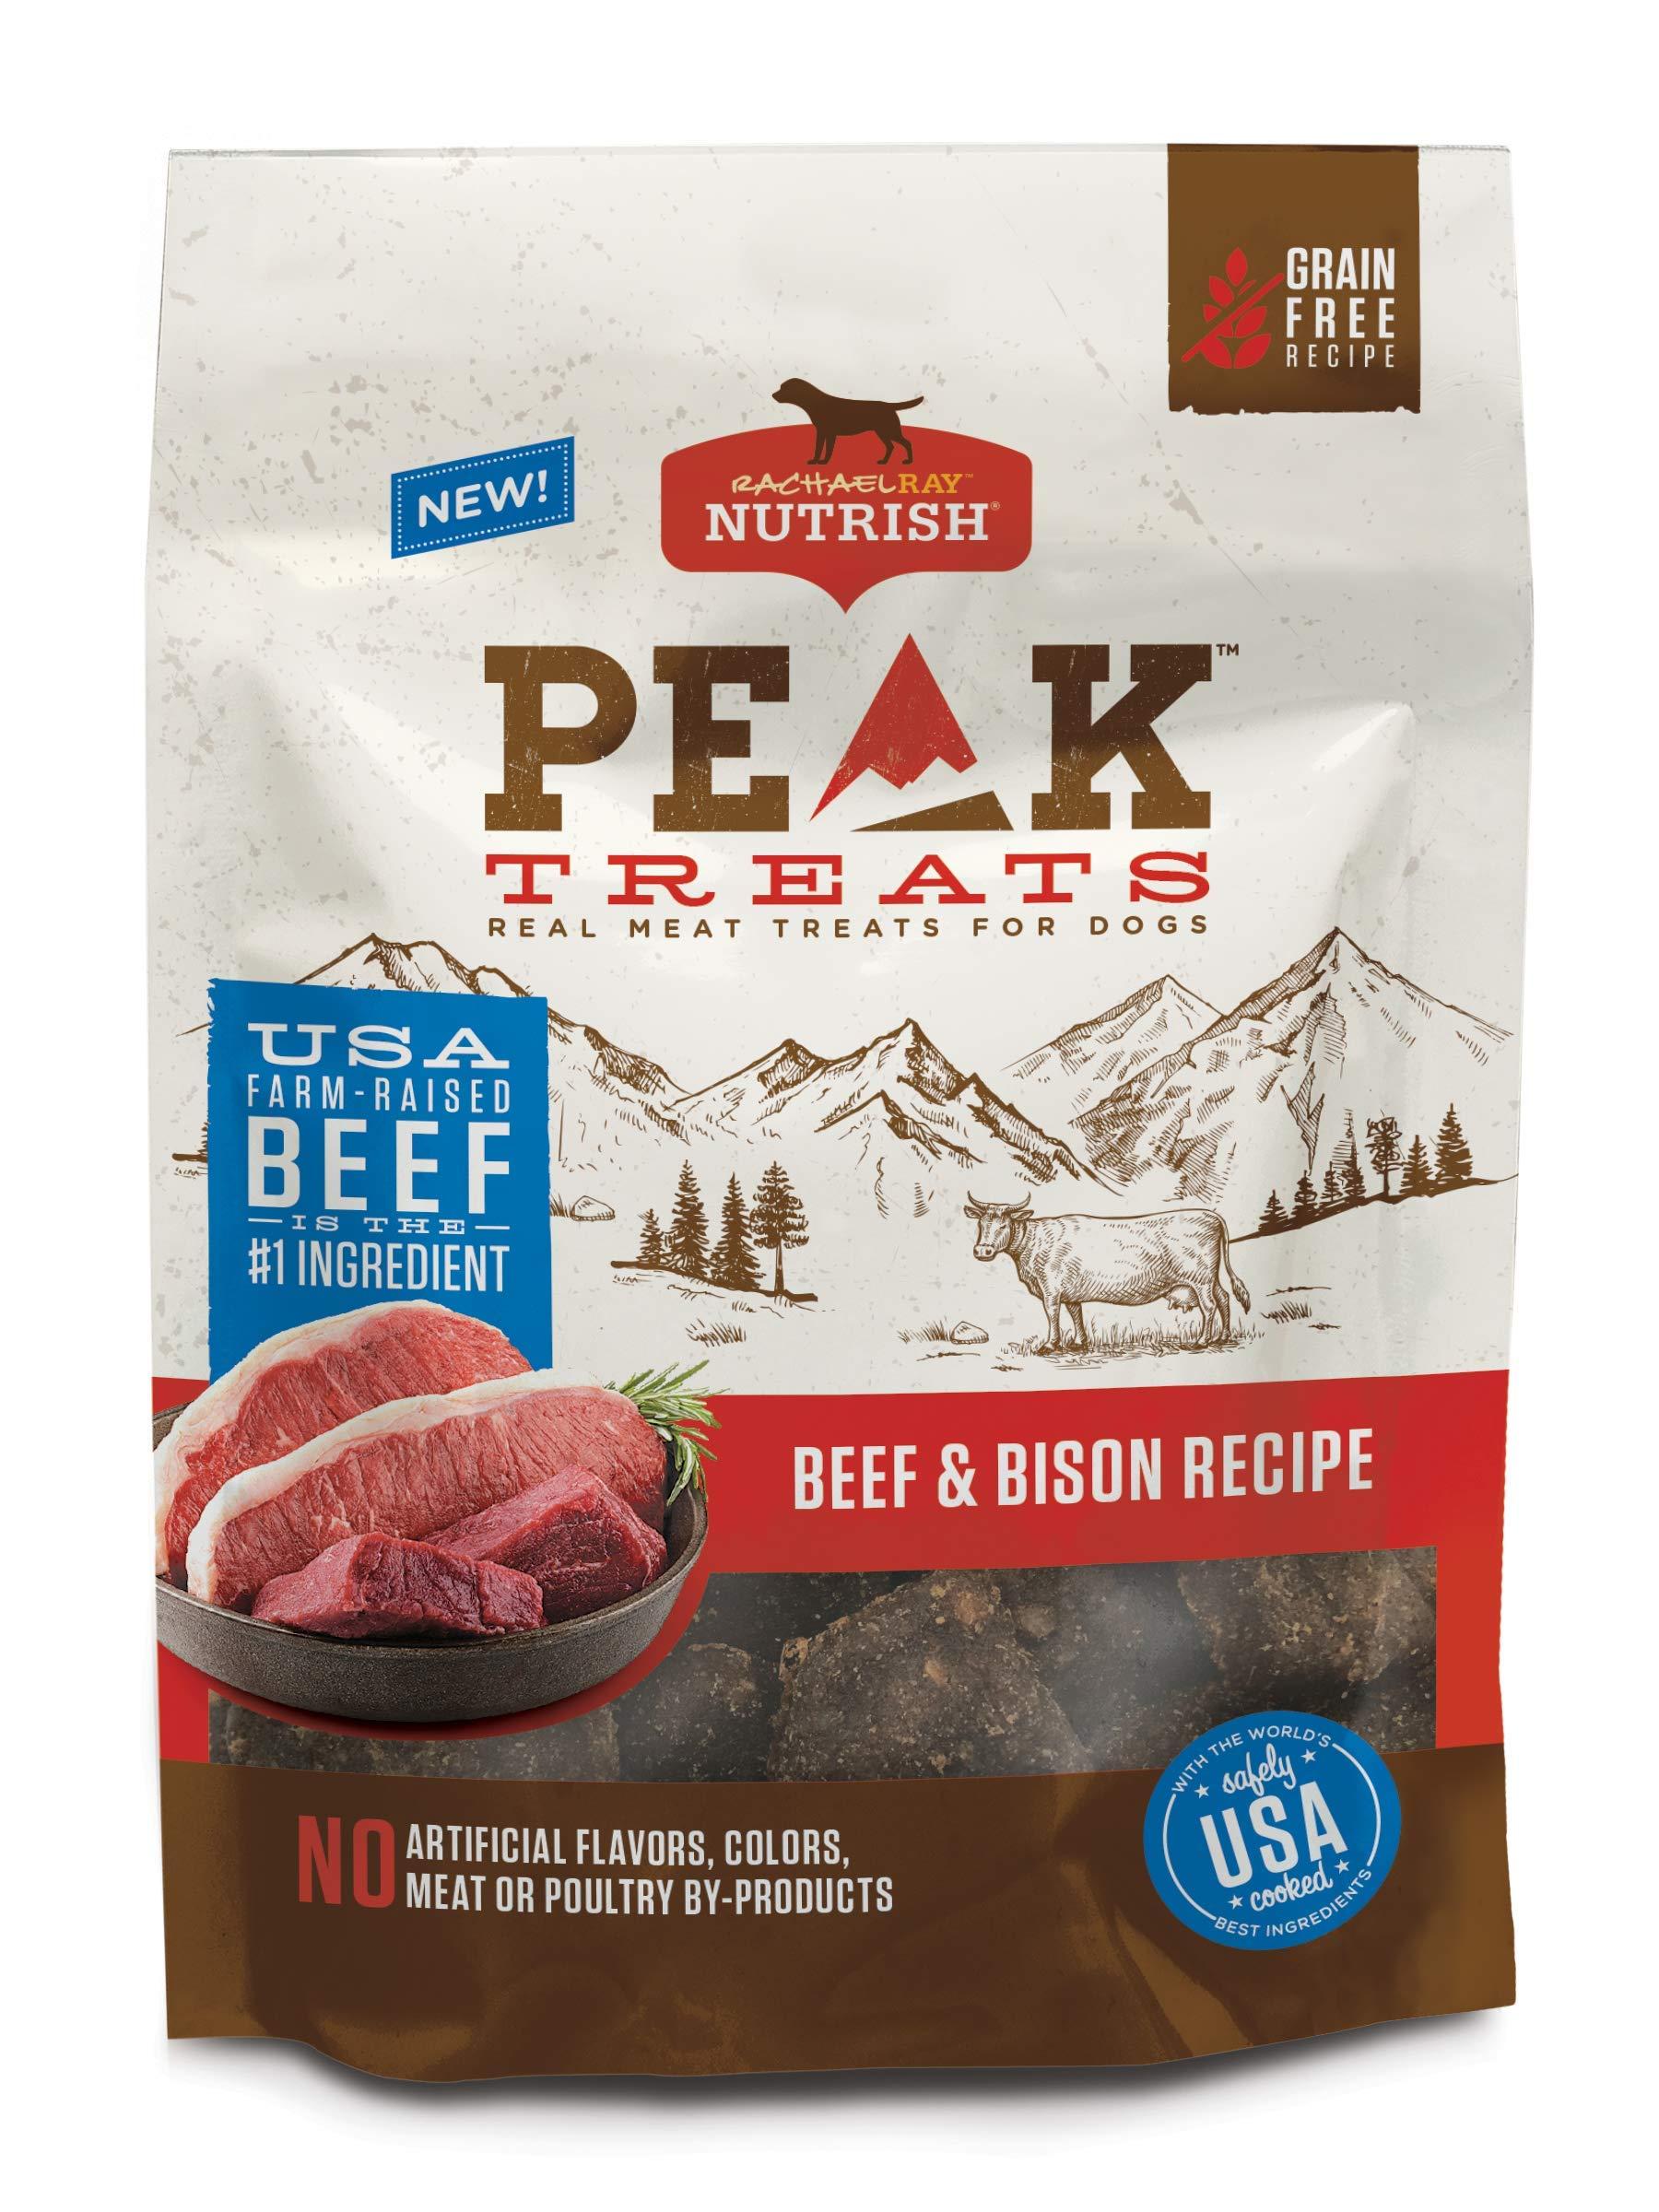 Rachael Ray Nutrish Peak Beef & Bison Recipe Dog Treats, 12 Ounces, Grain Free